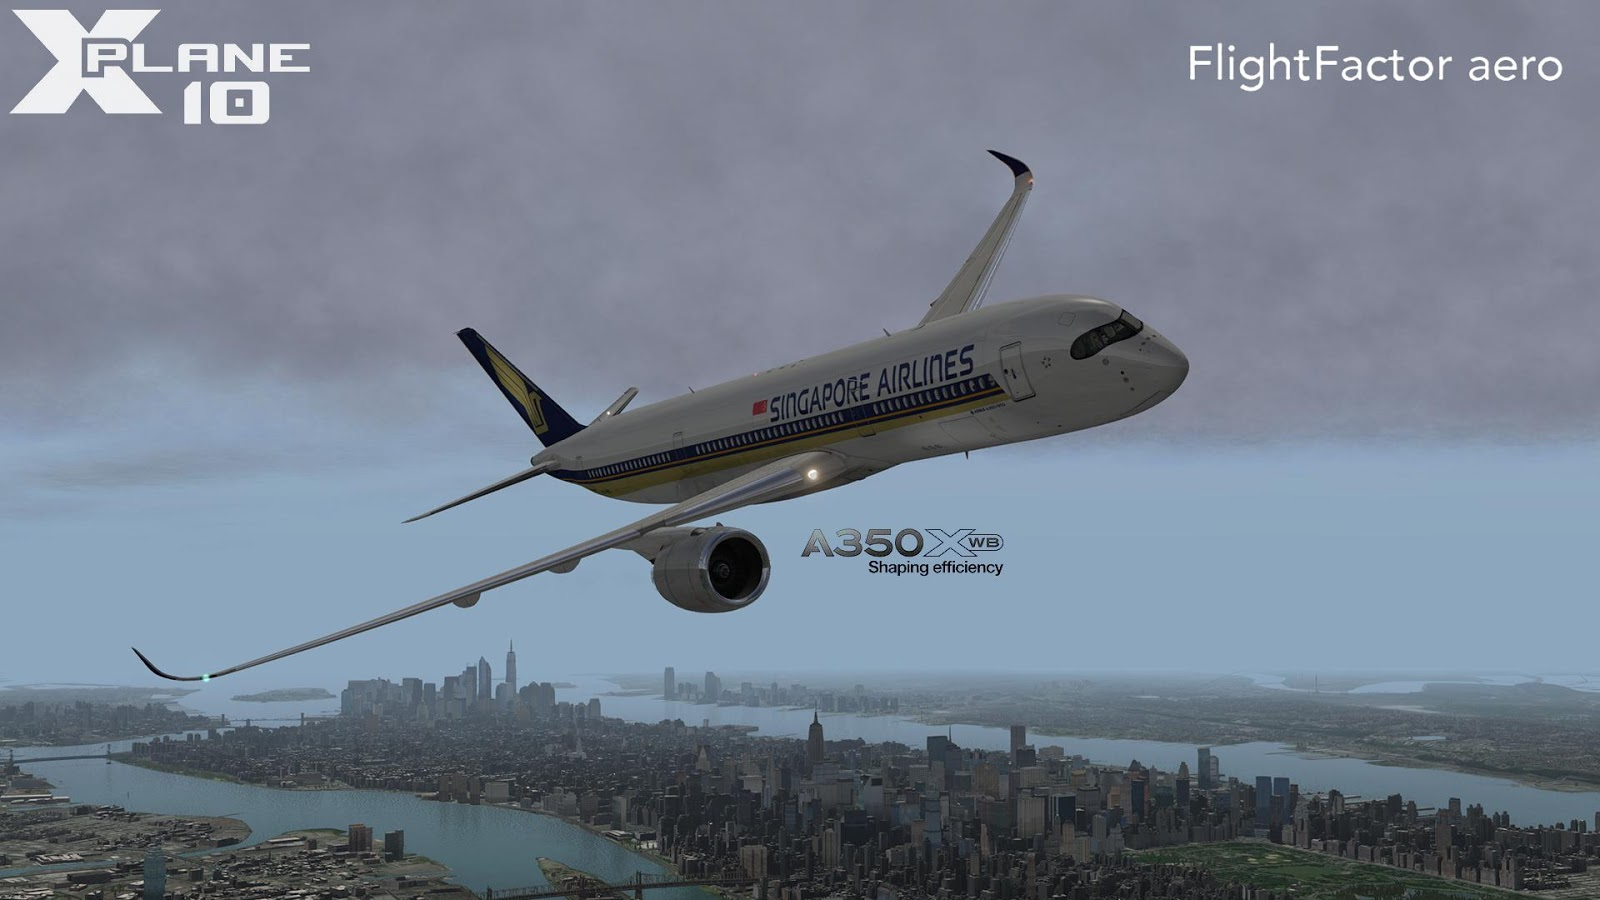 Flightfactor aero Airbus A350 v1 31 X Plane 10 - Ariel